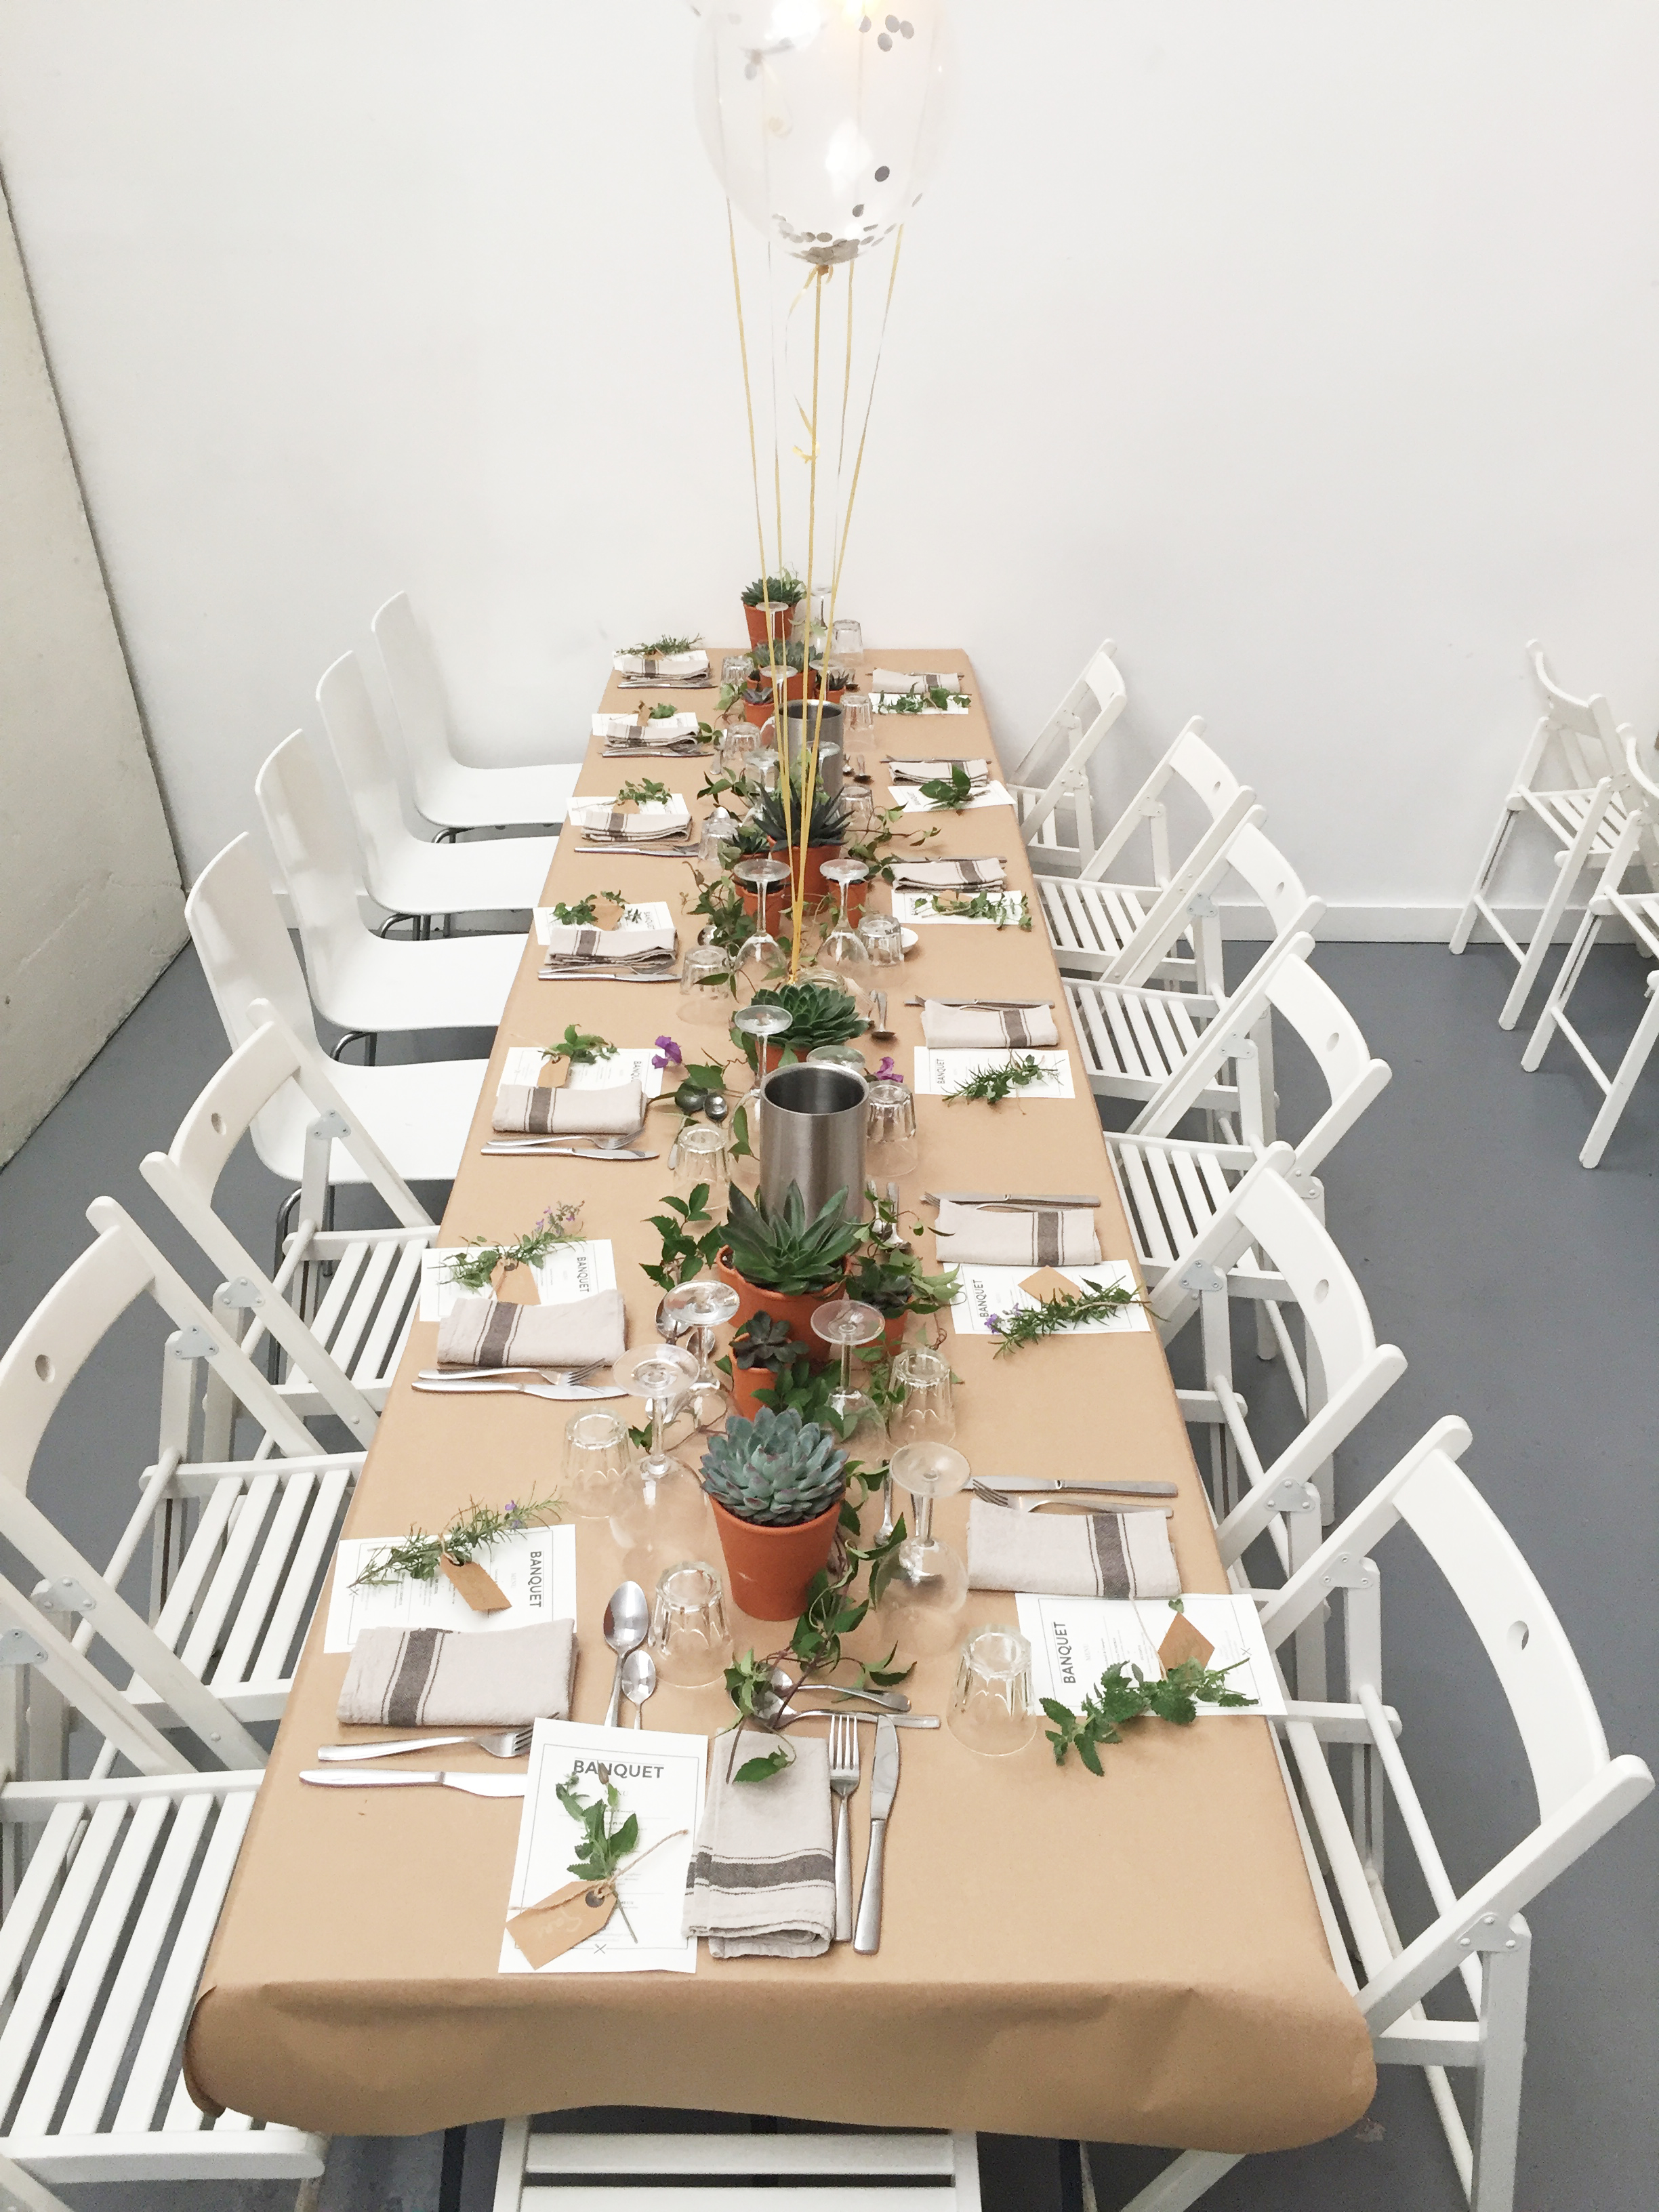 Table2Setup.jpg